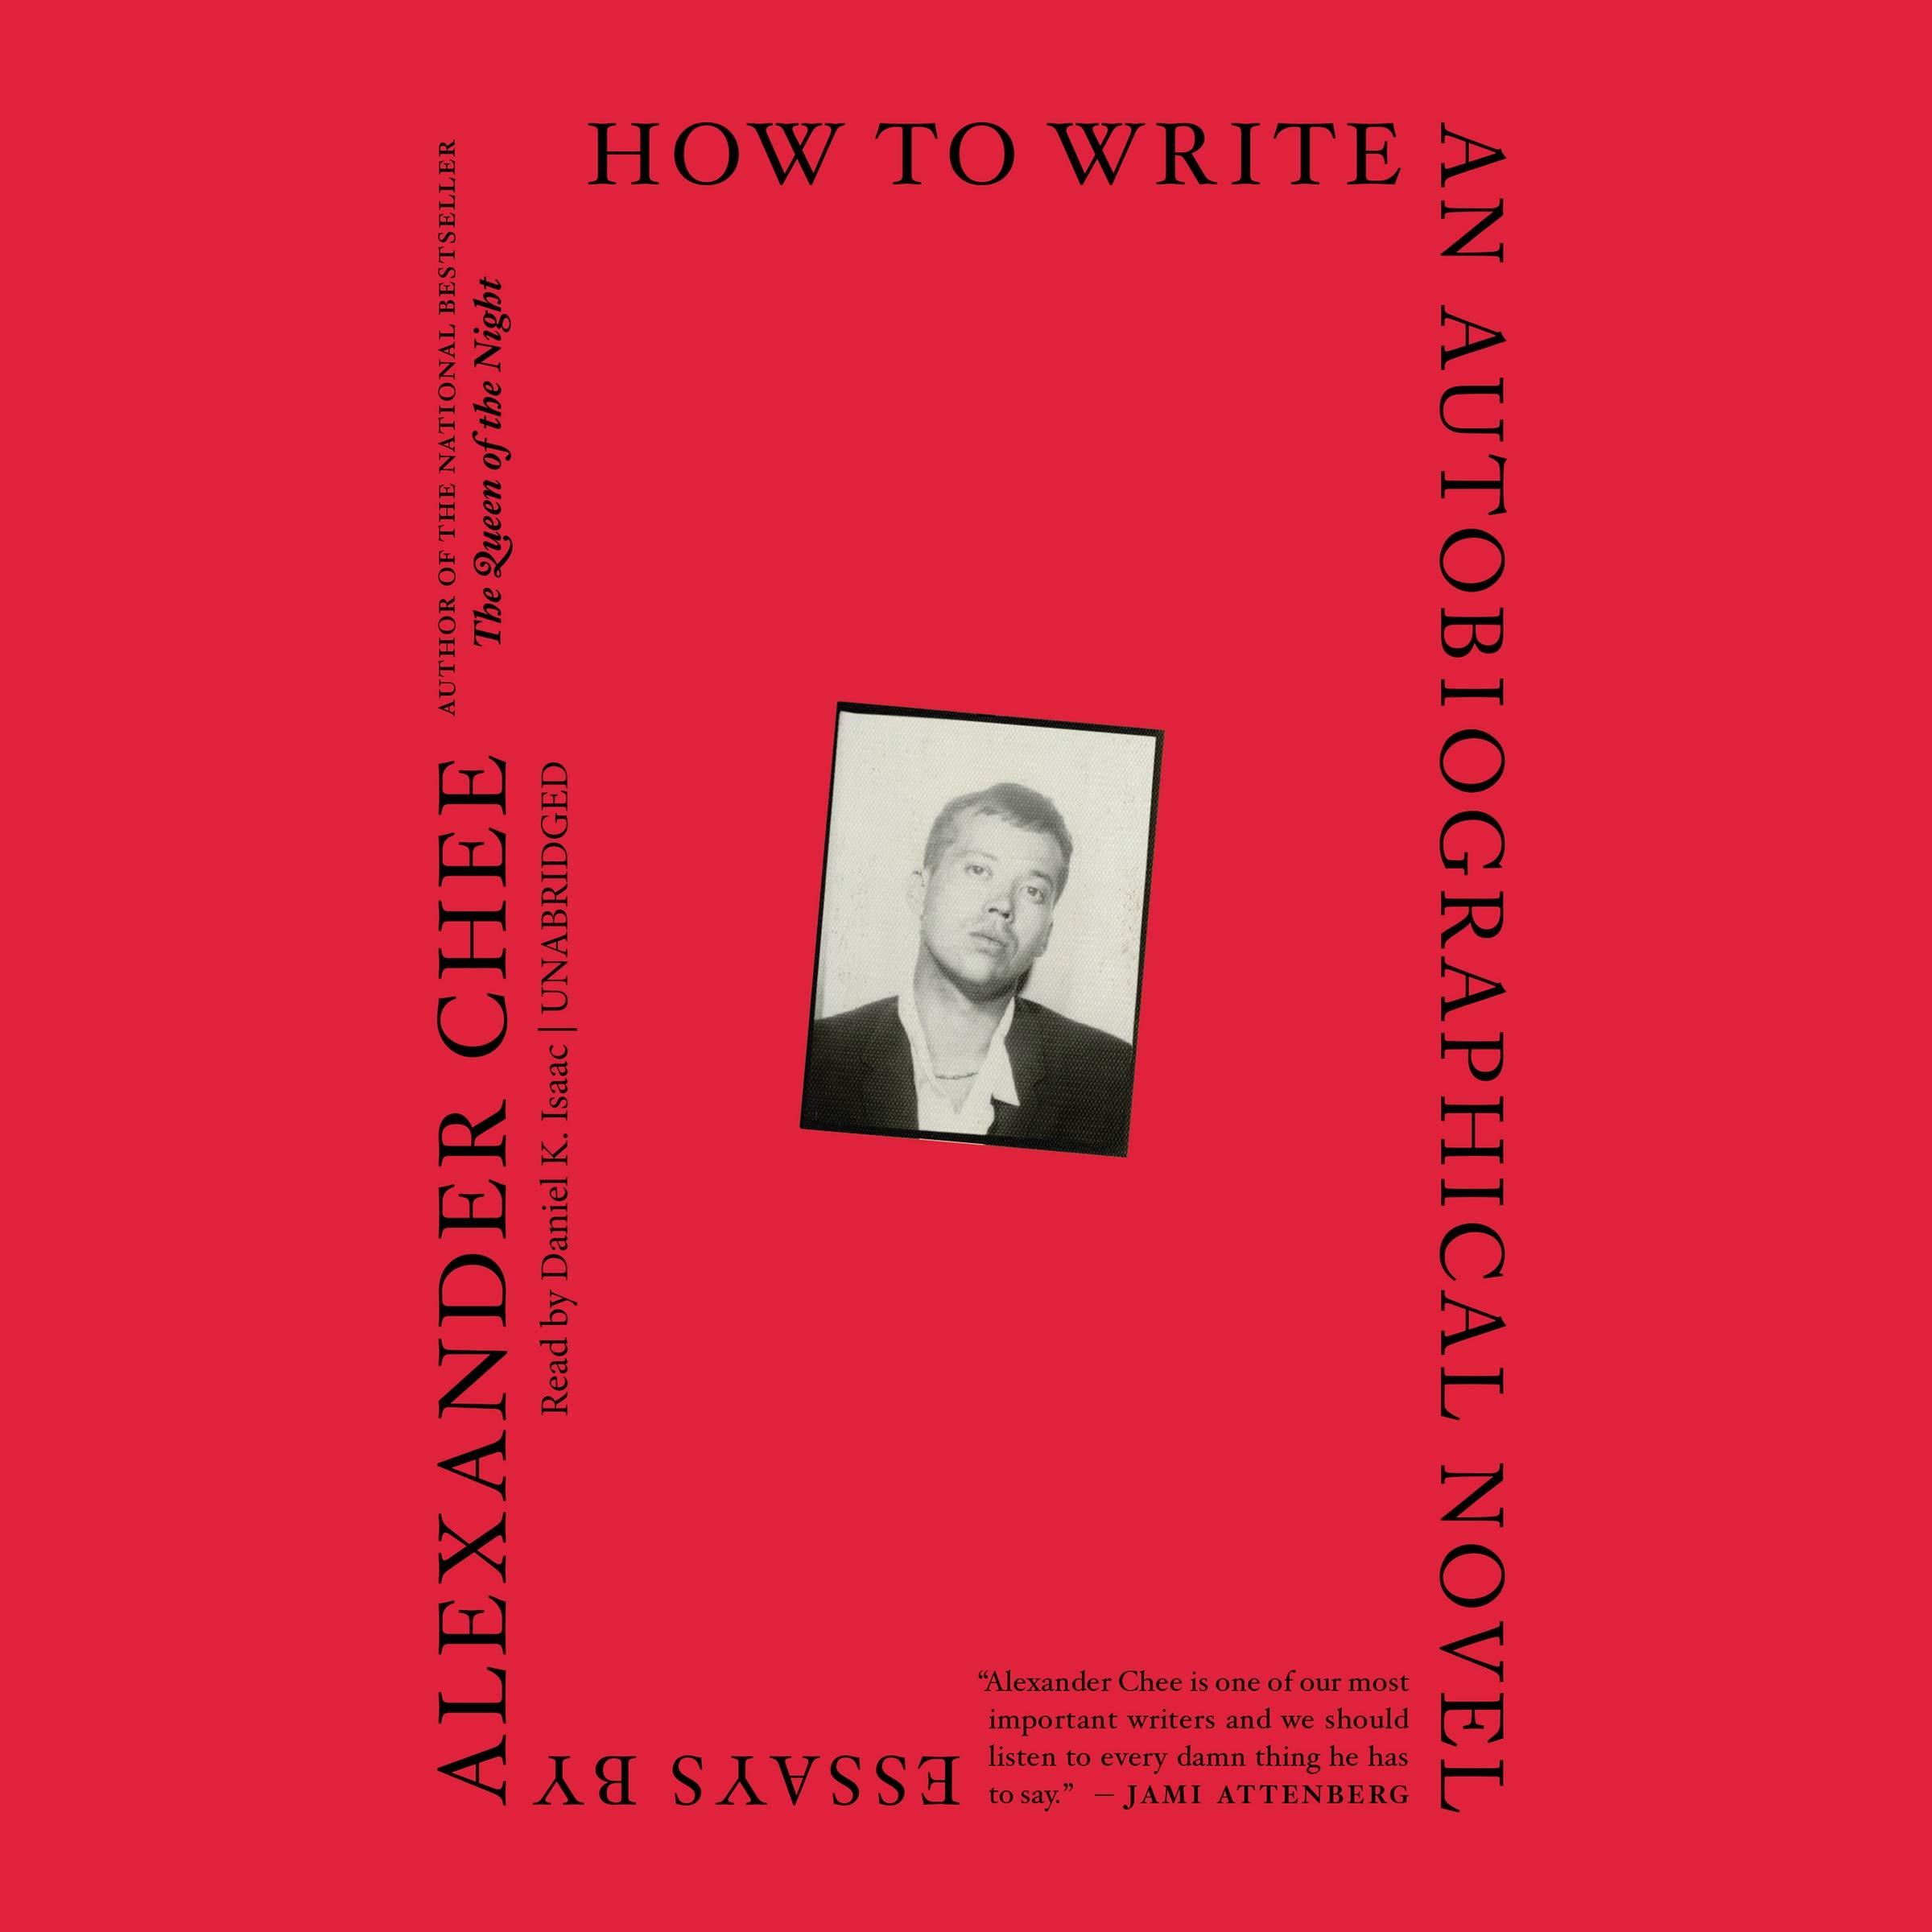 How to Write an Autobiographical Novel: Essays: Amazon.de: Chee